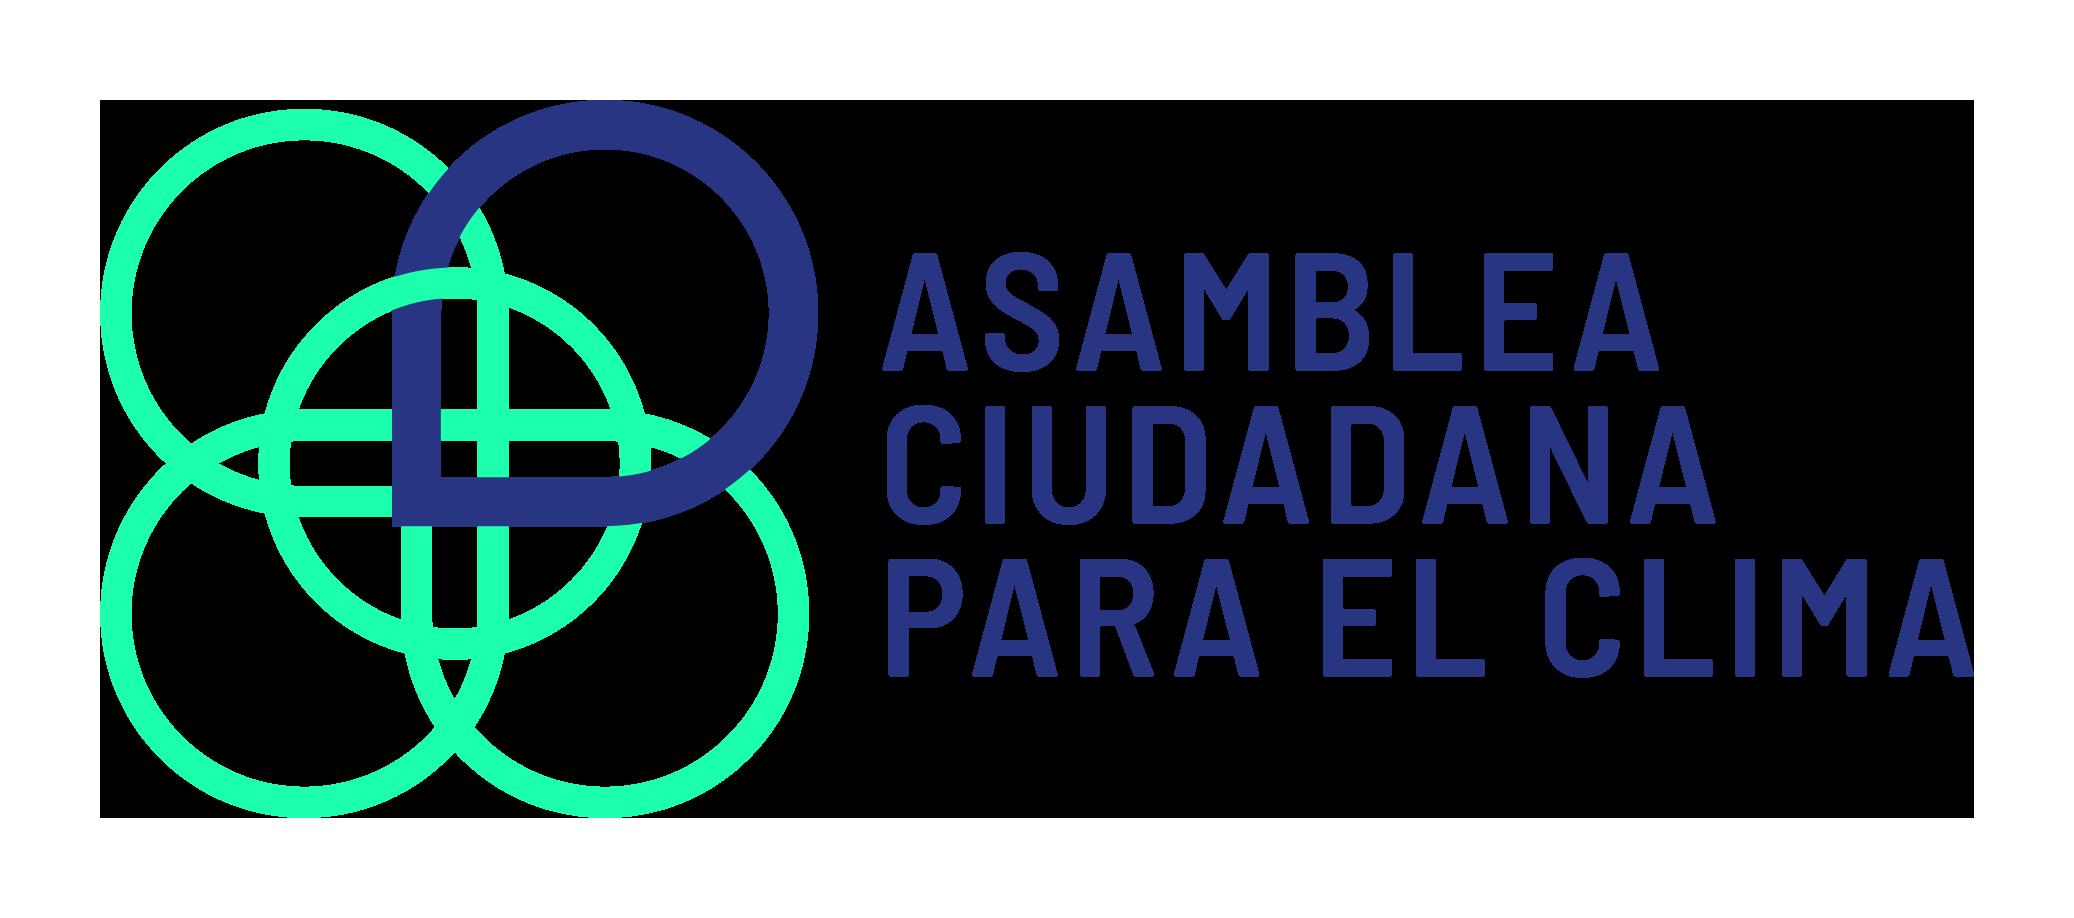 Asamblea ciudadana de cambio climático